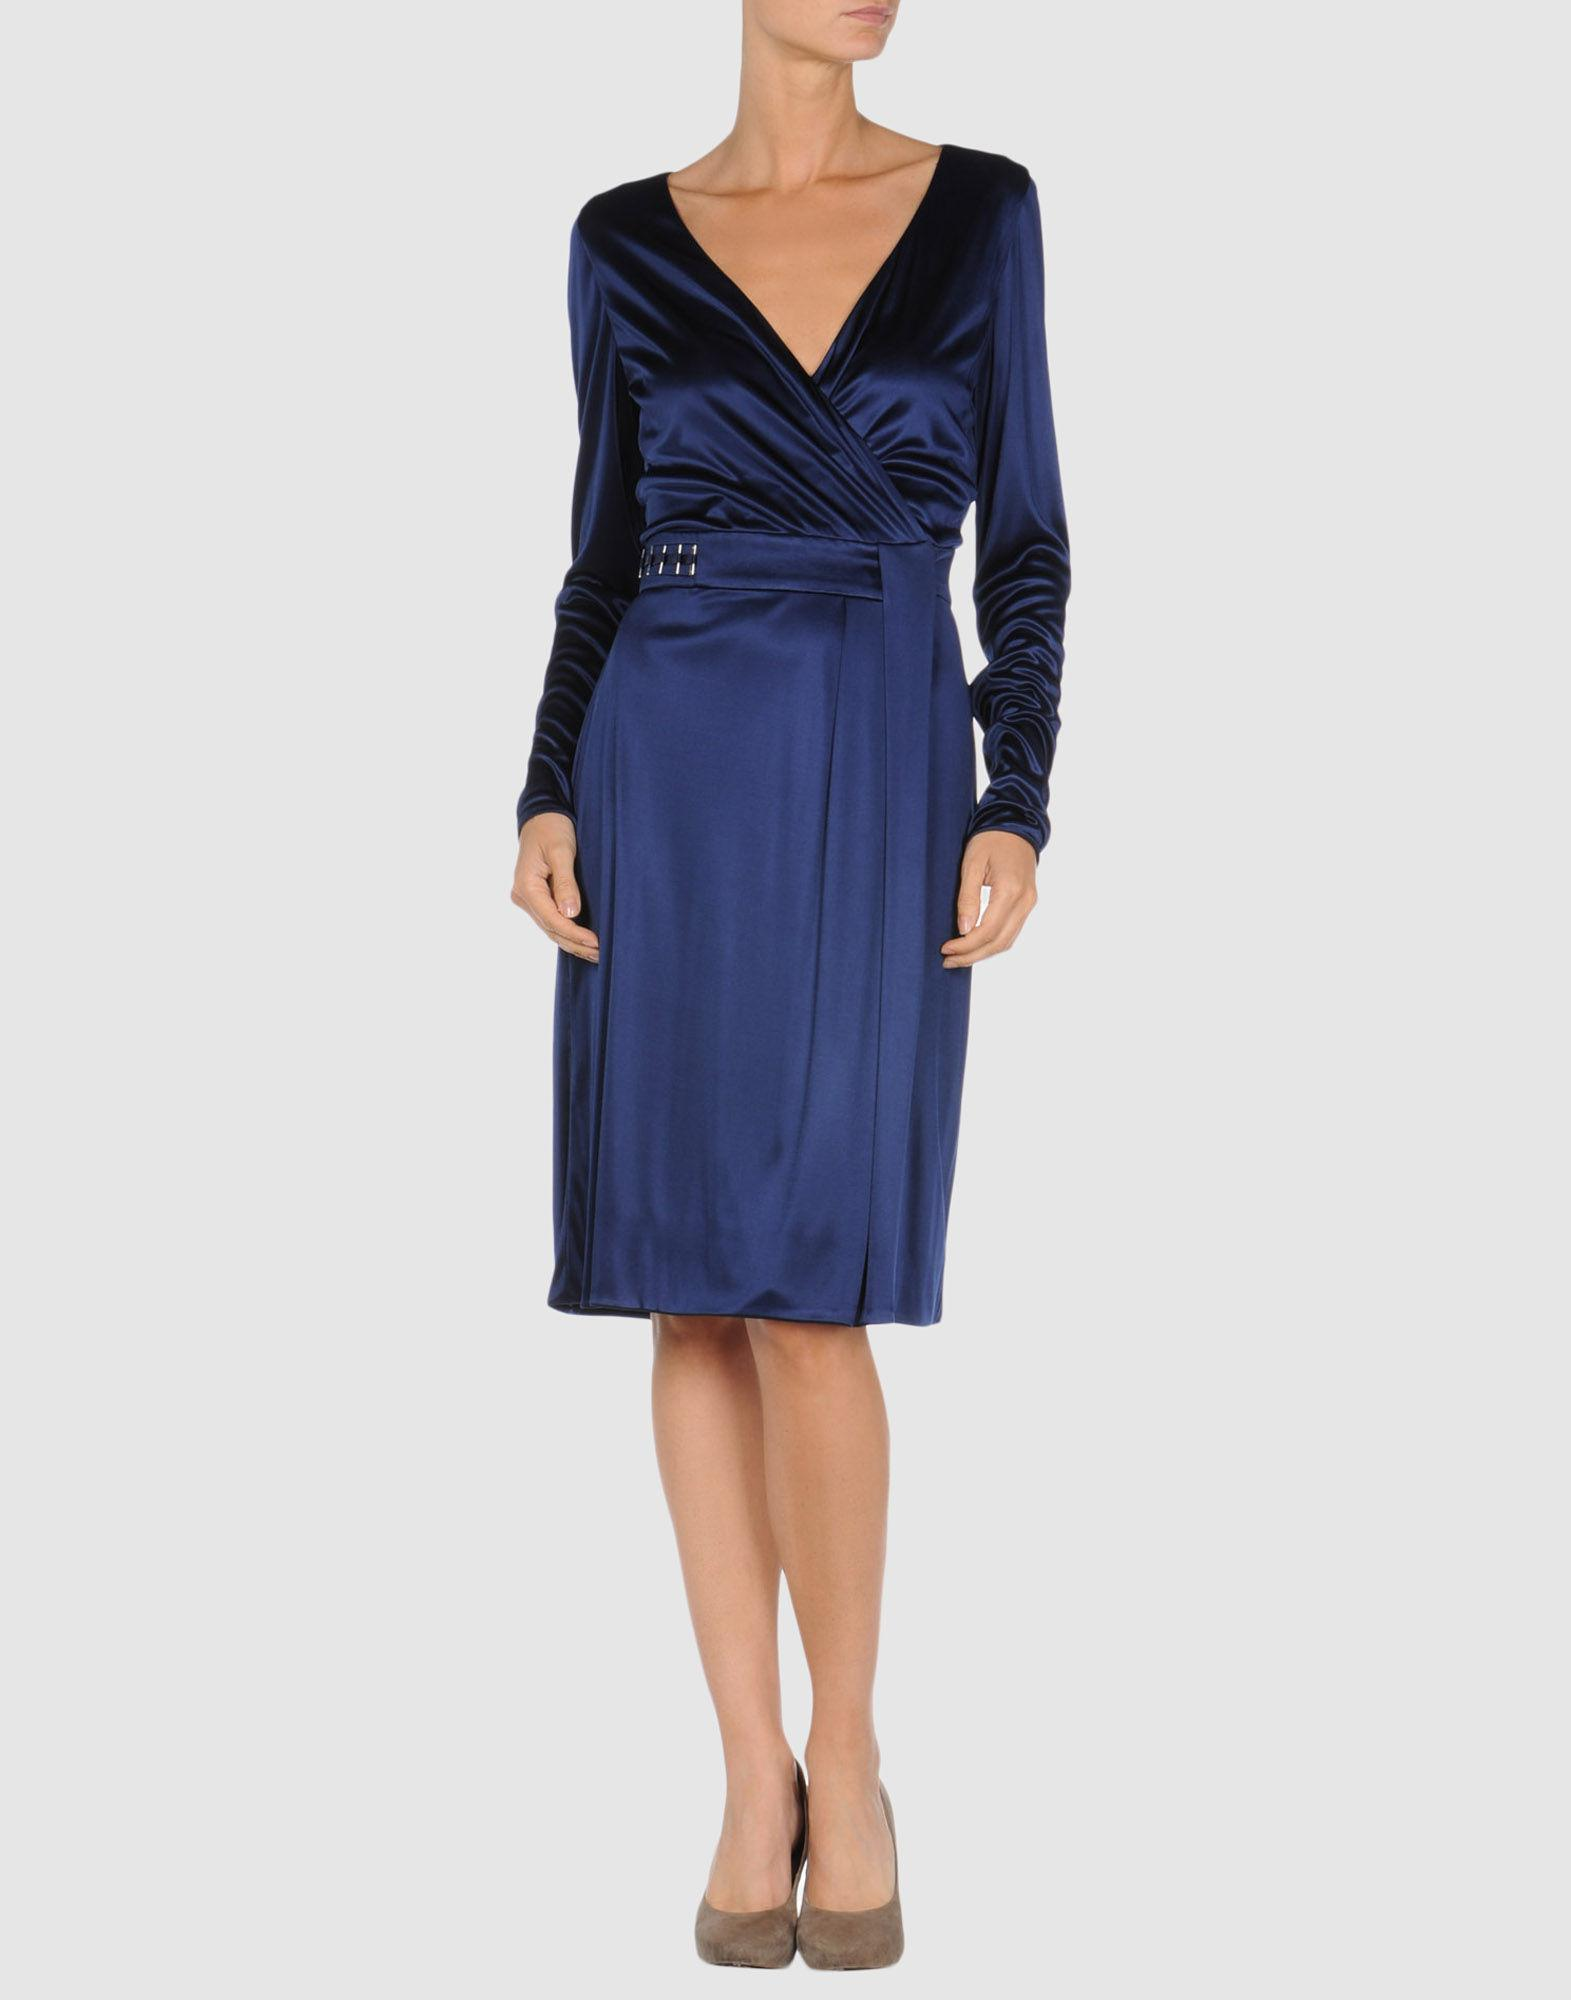 34225001HW 14 f - Evening Φορεματα Versace 2011 2012 Κωδ.21